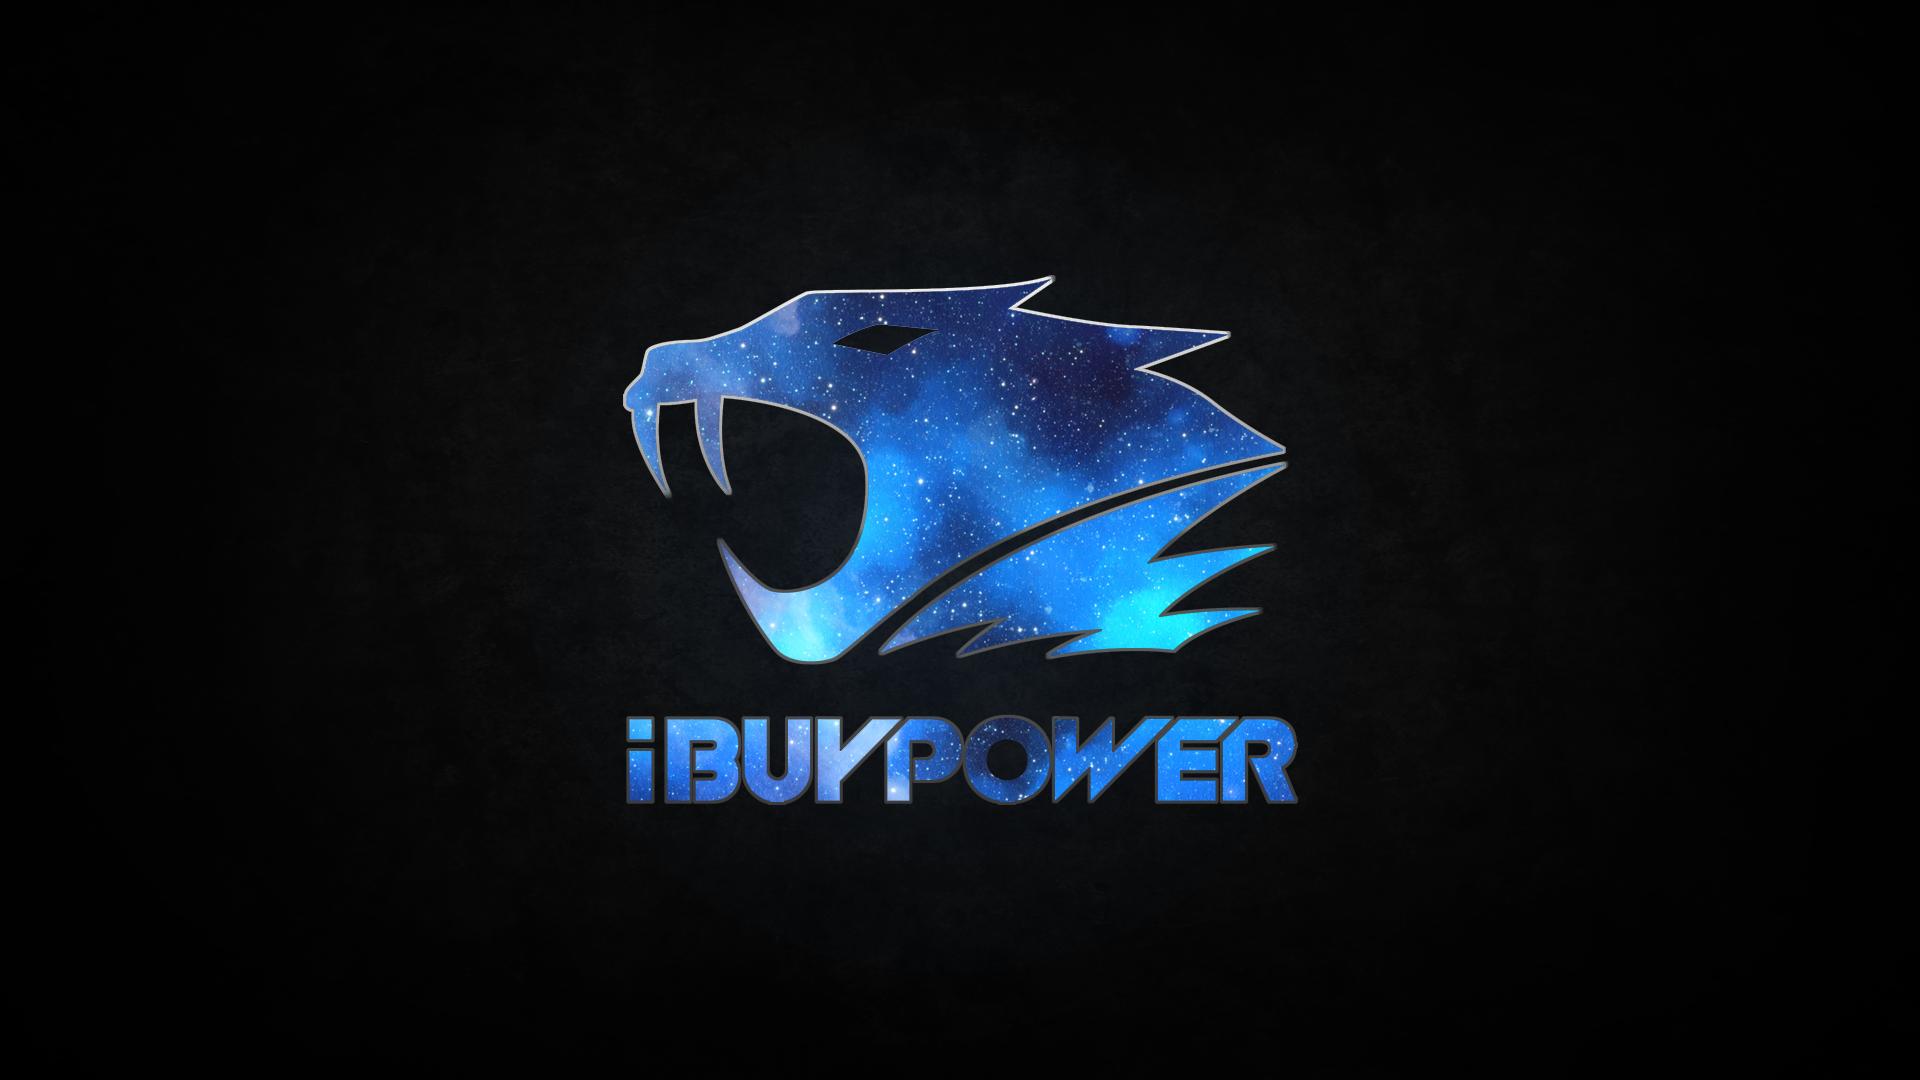 Ibuypower Wallpapers 4USkYcom 1920x1080